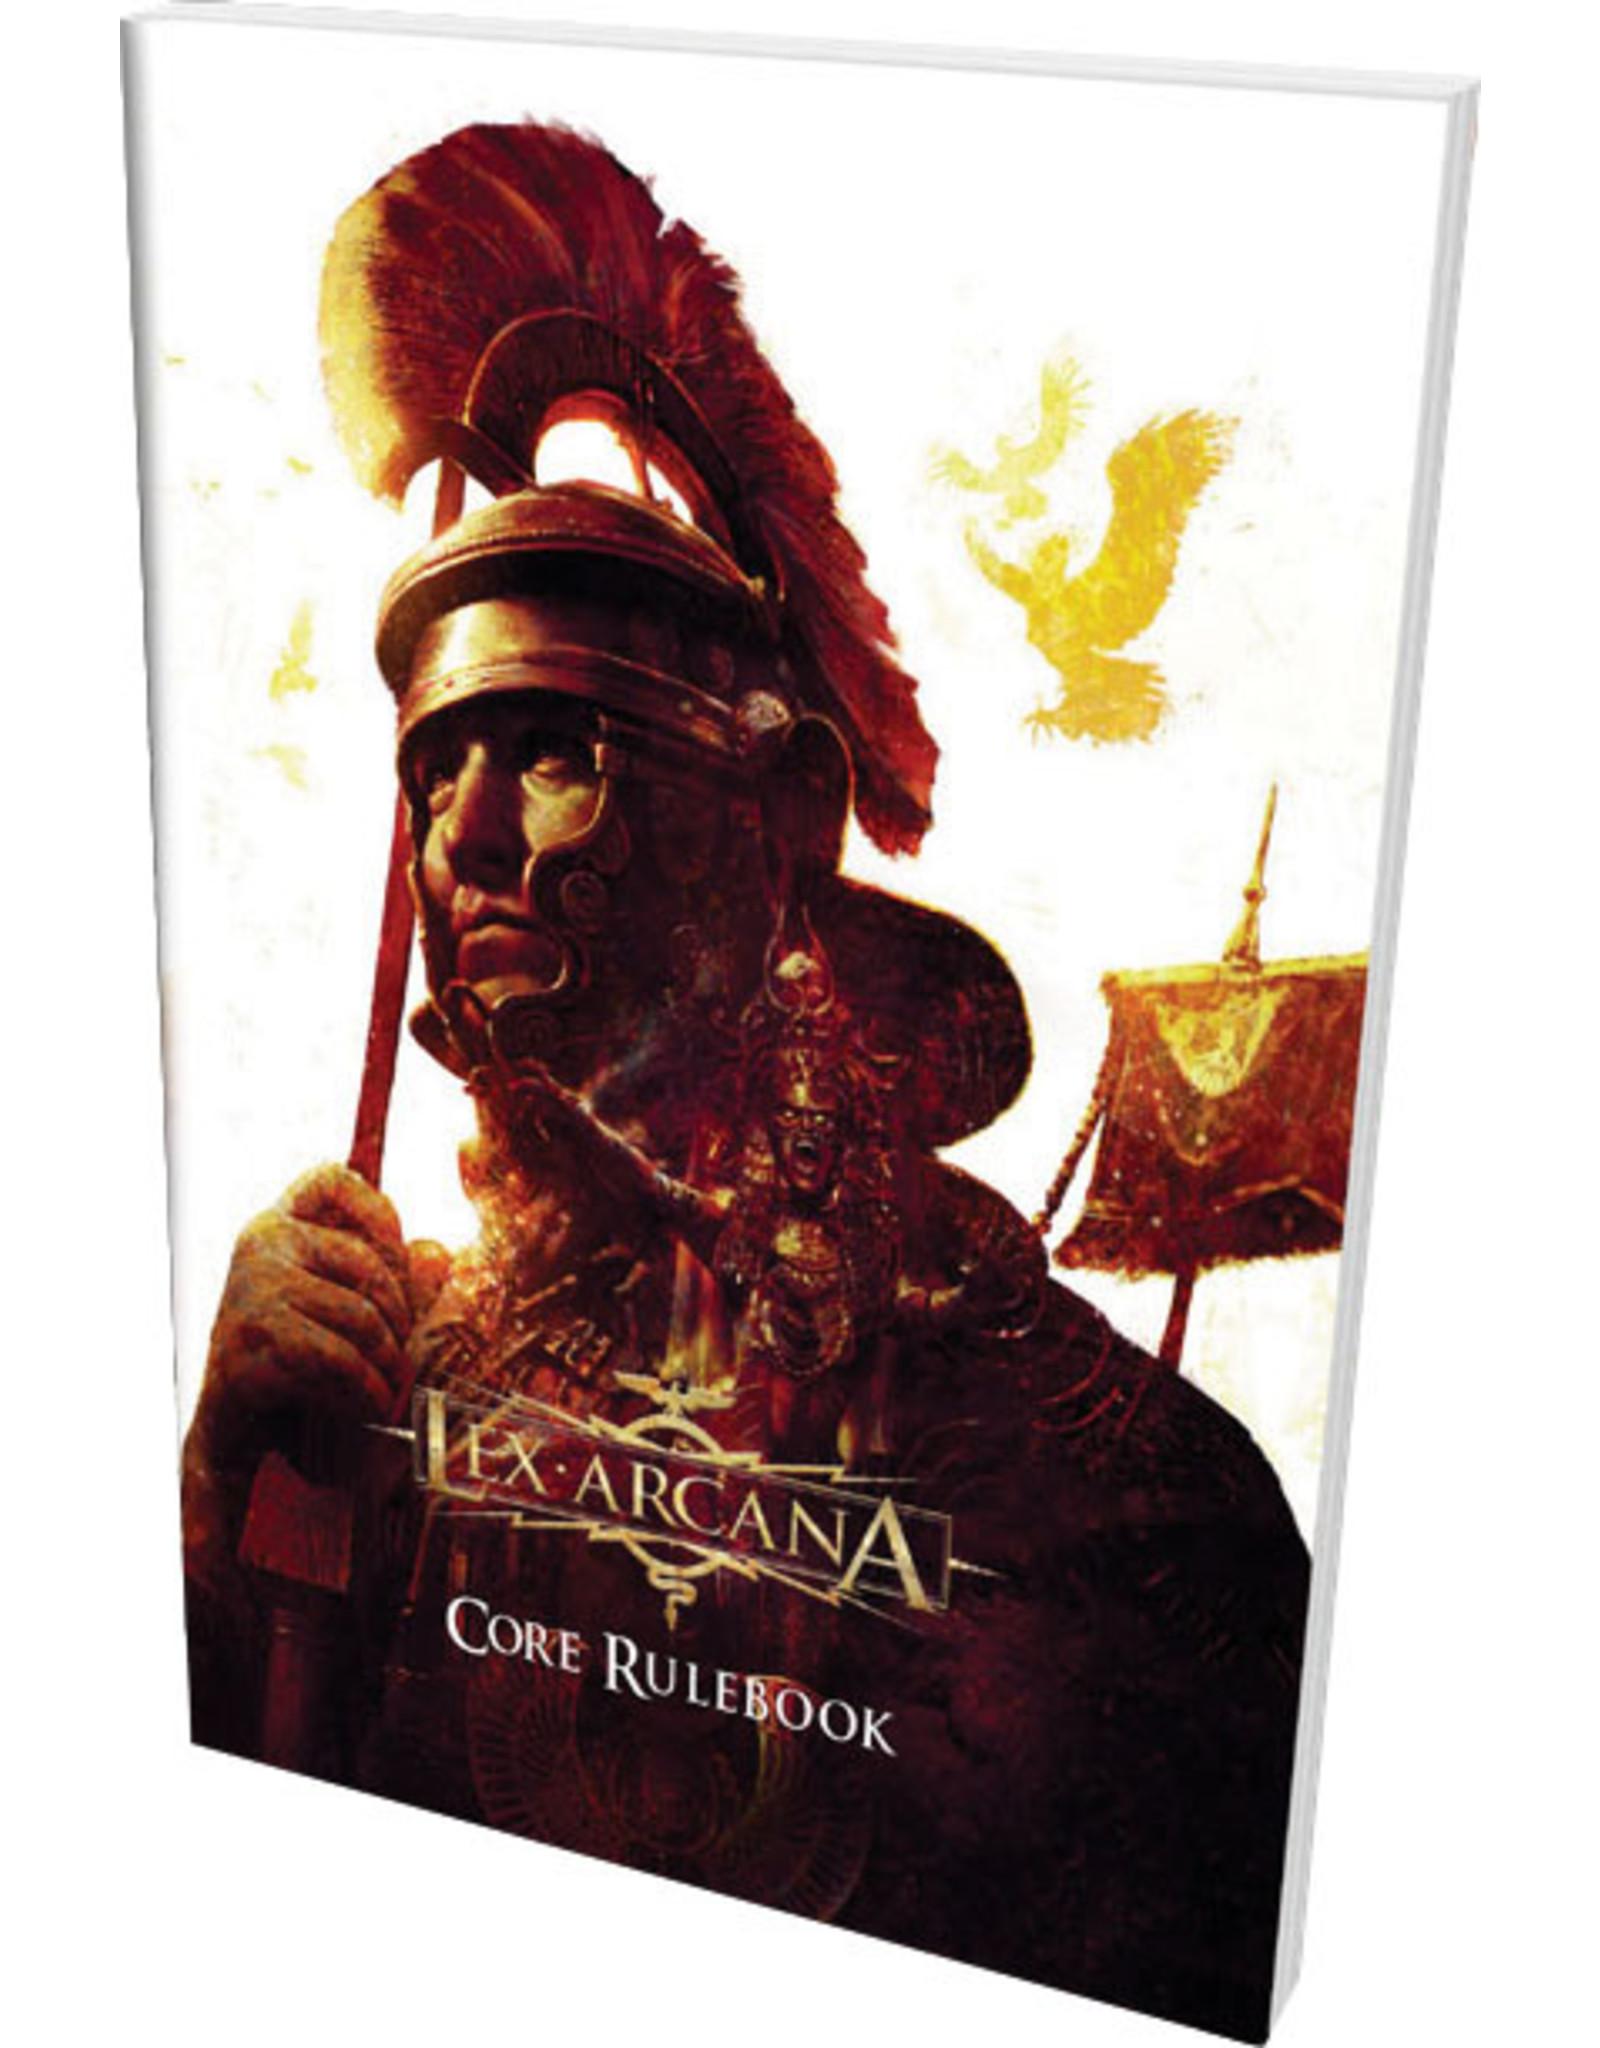 Quality Games Lex Arcana RPG Core Rulebook